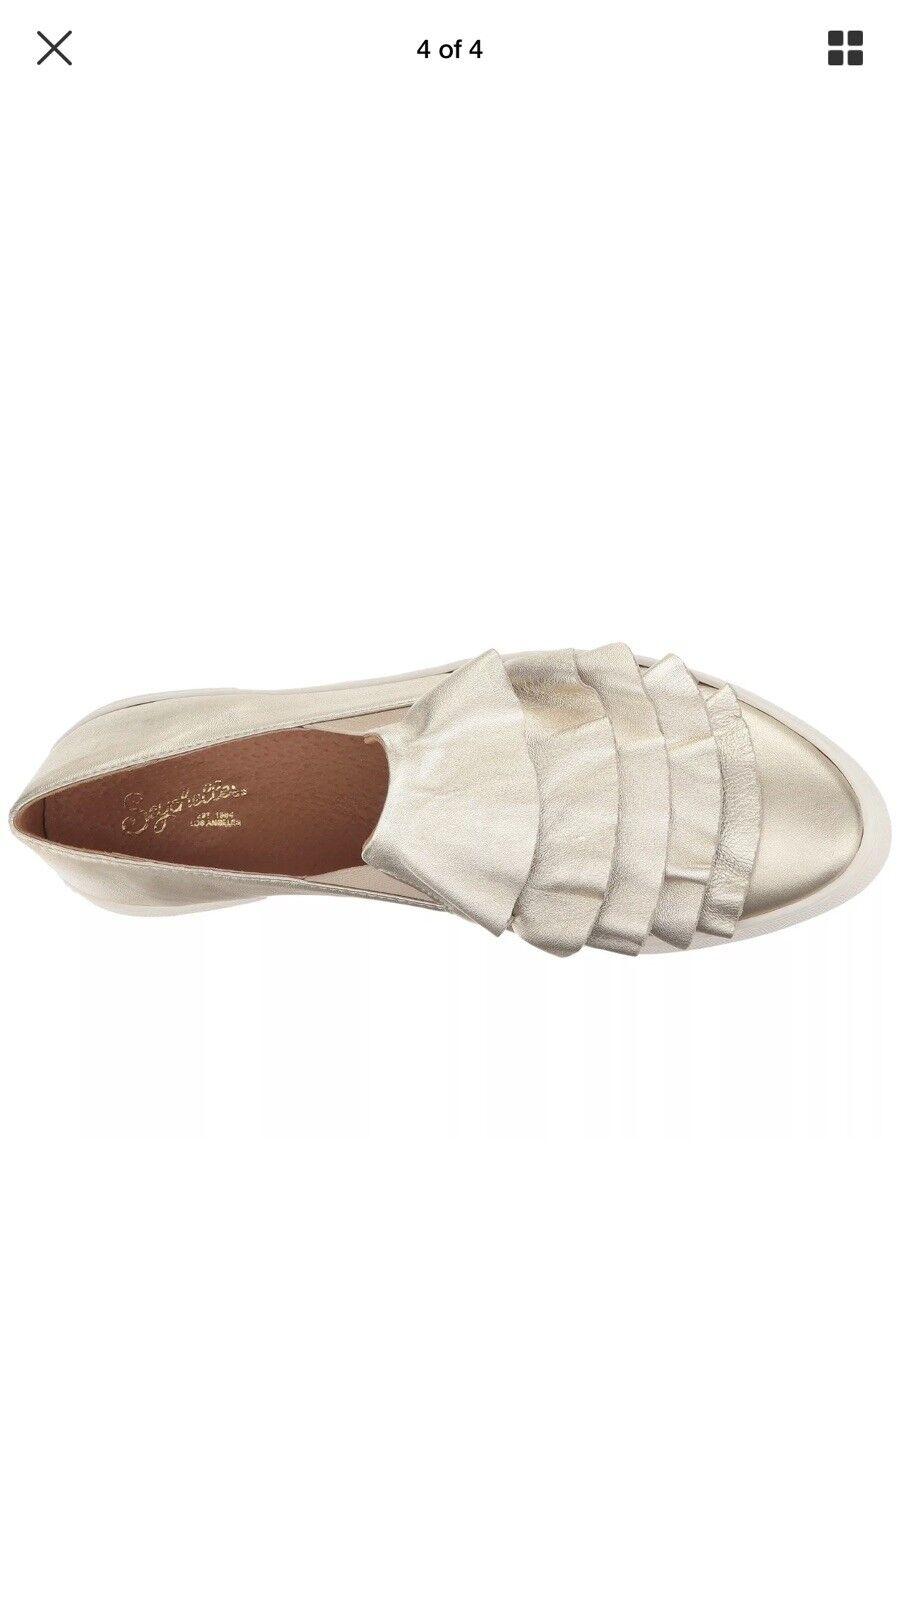 NIB NIB NIB SEYCHELLES Quake gold Leather Loafers 09664b